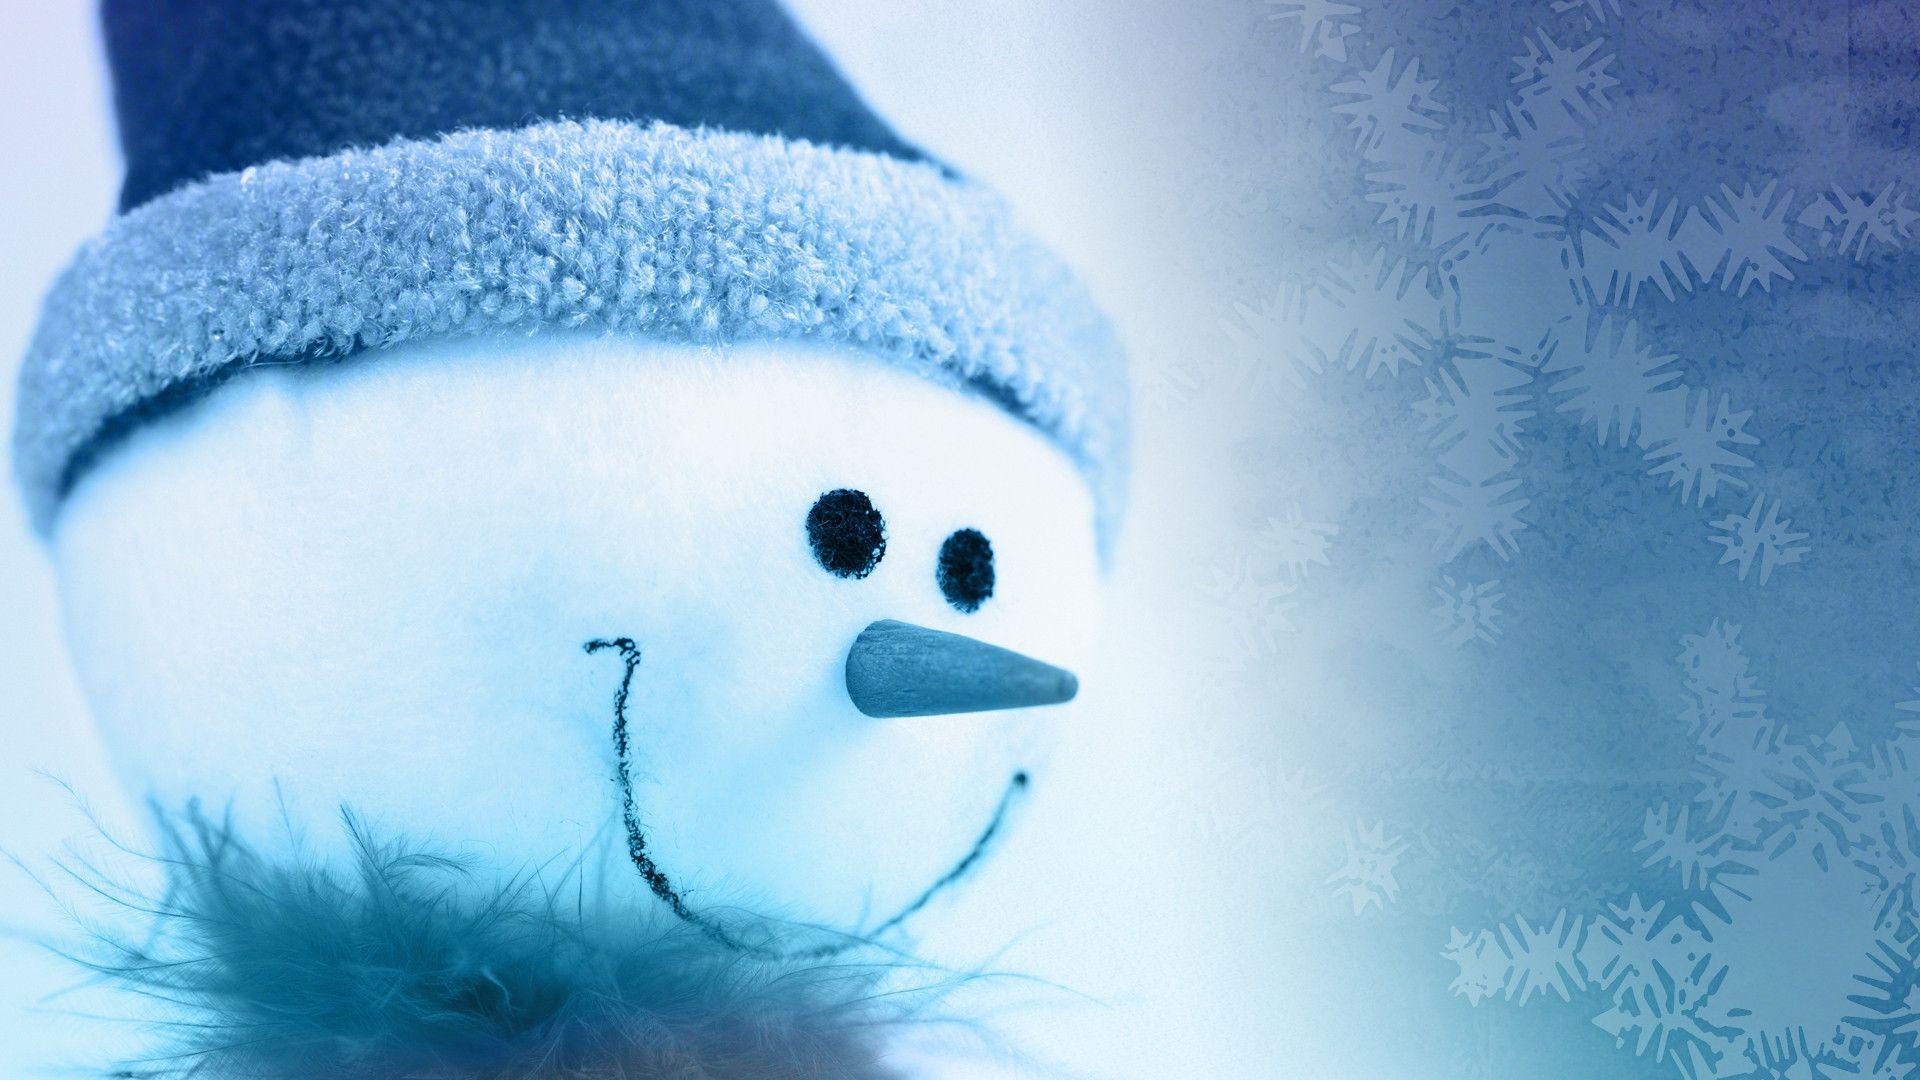 snowman desktop background - photo #8